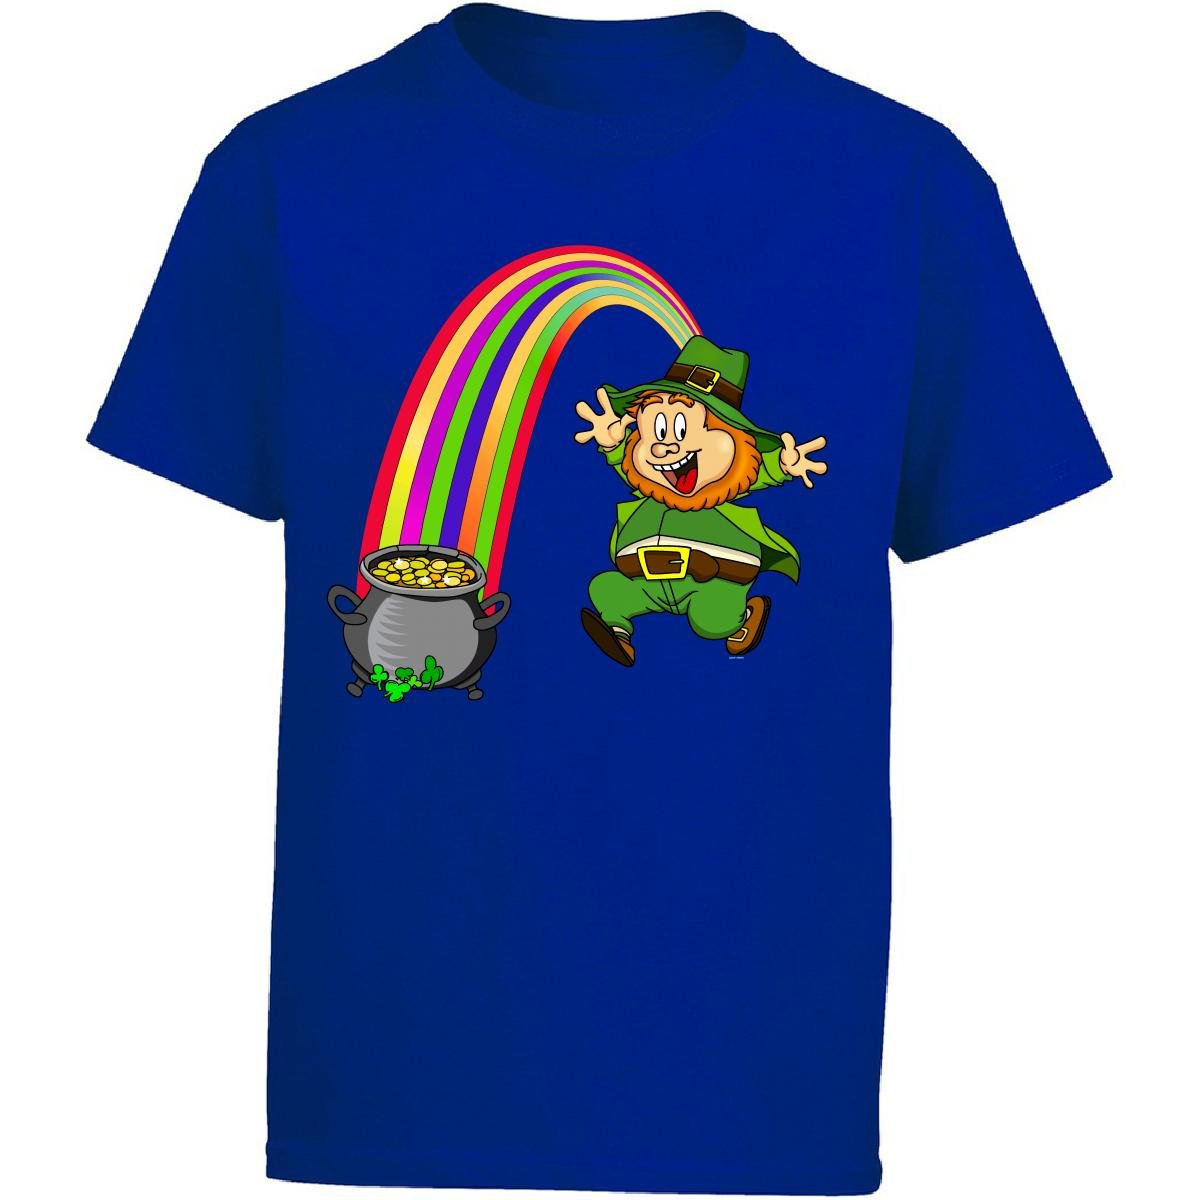 a557abab Amazon.com: BADASS REPUBLIC Funny Leprechaun ST Patricks Day Parade Gift  For Men Woman - Girl Kids T-Shirt: Clothing